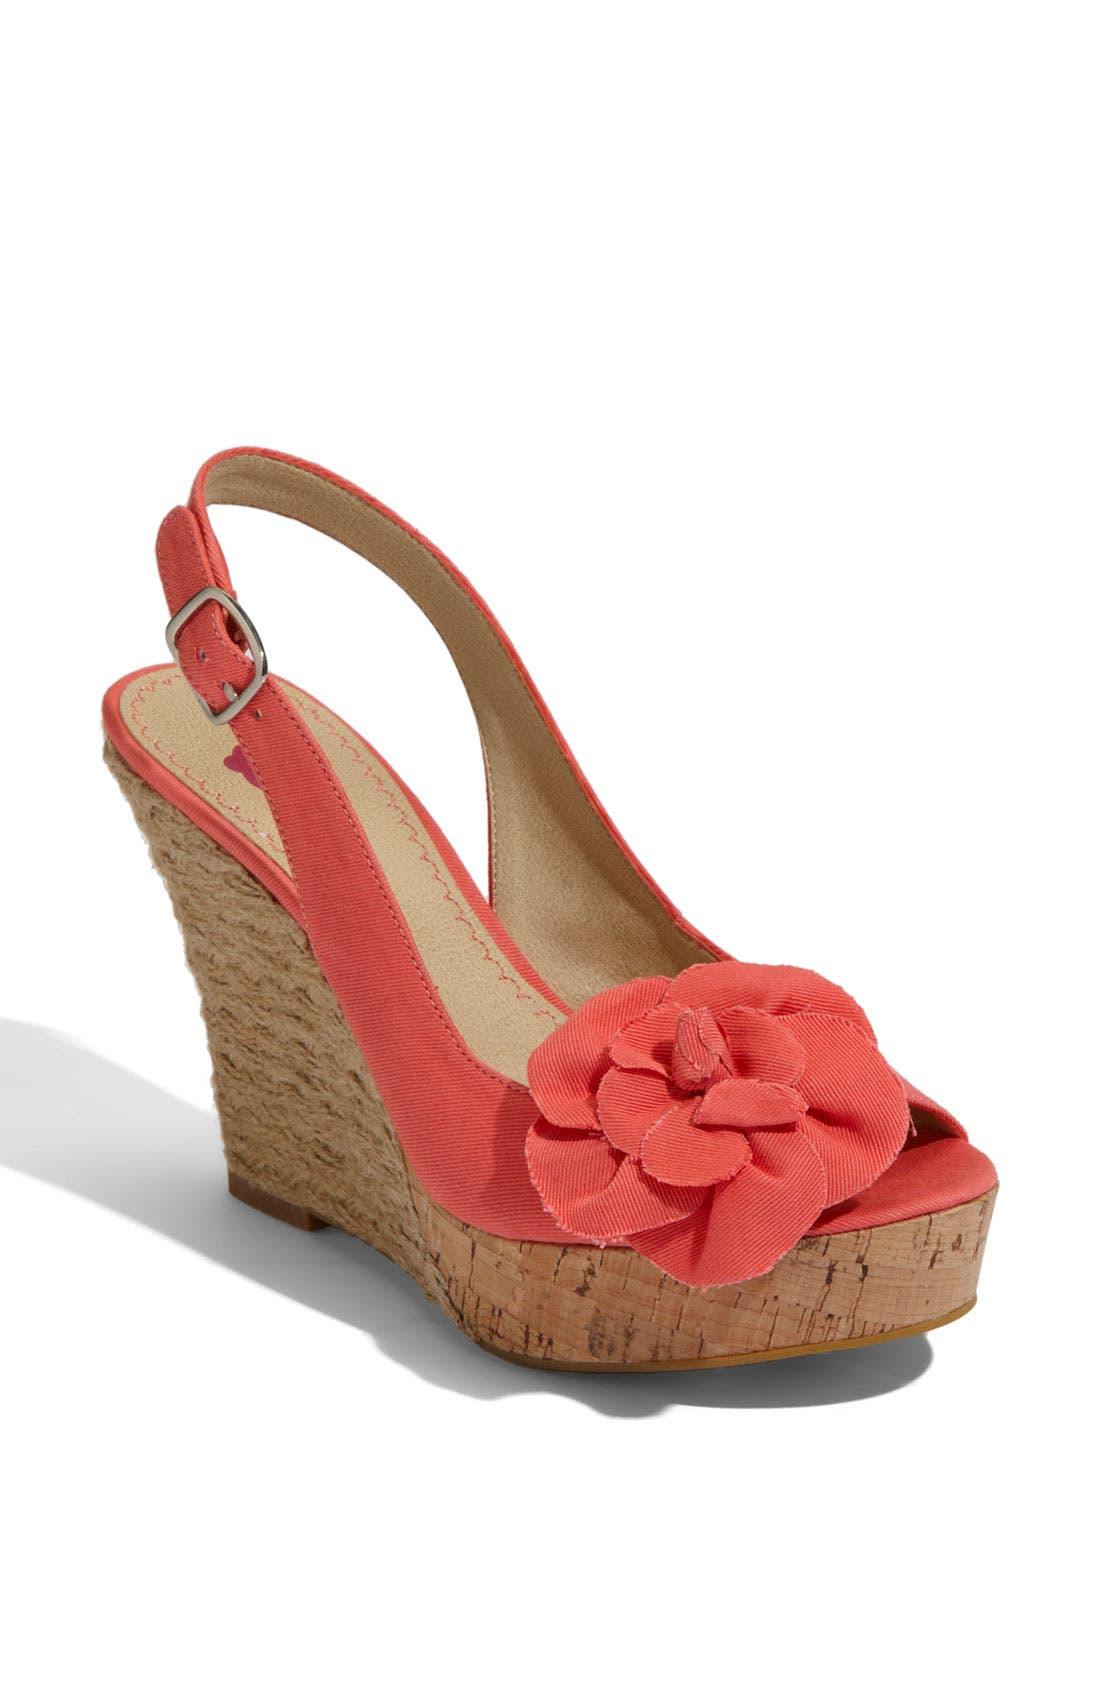 Main Image - BP. 'Blooms' Espadrille Slingback Sandal